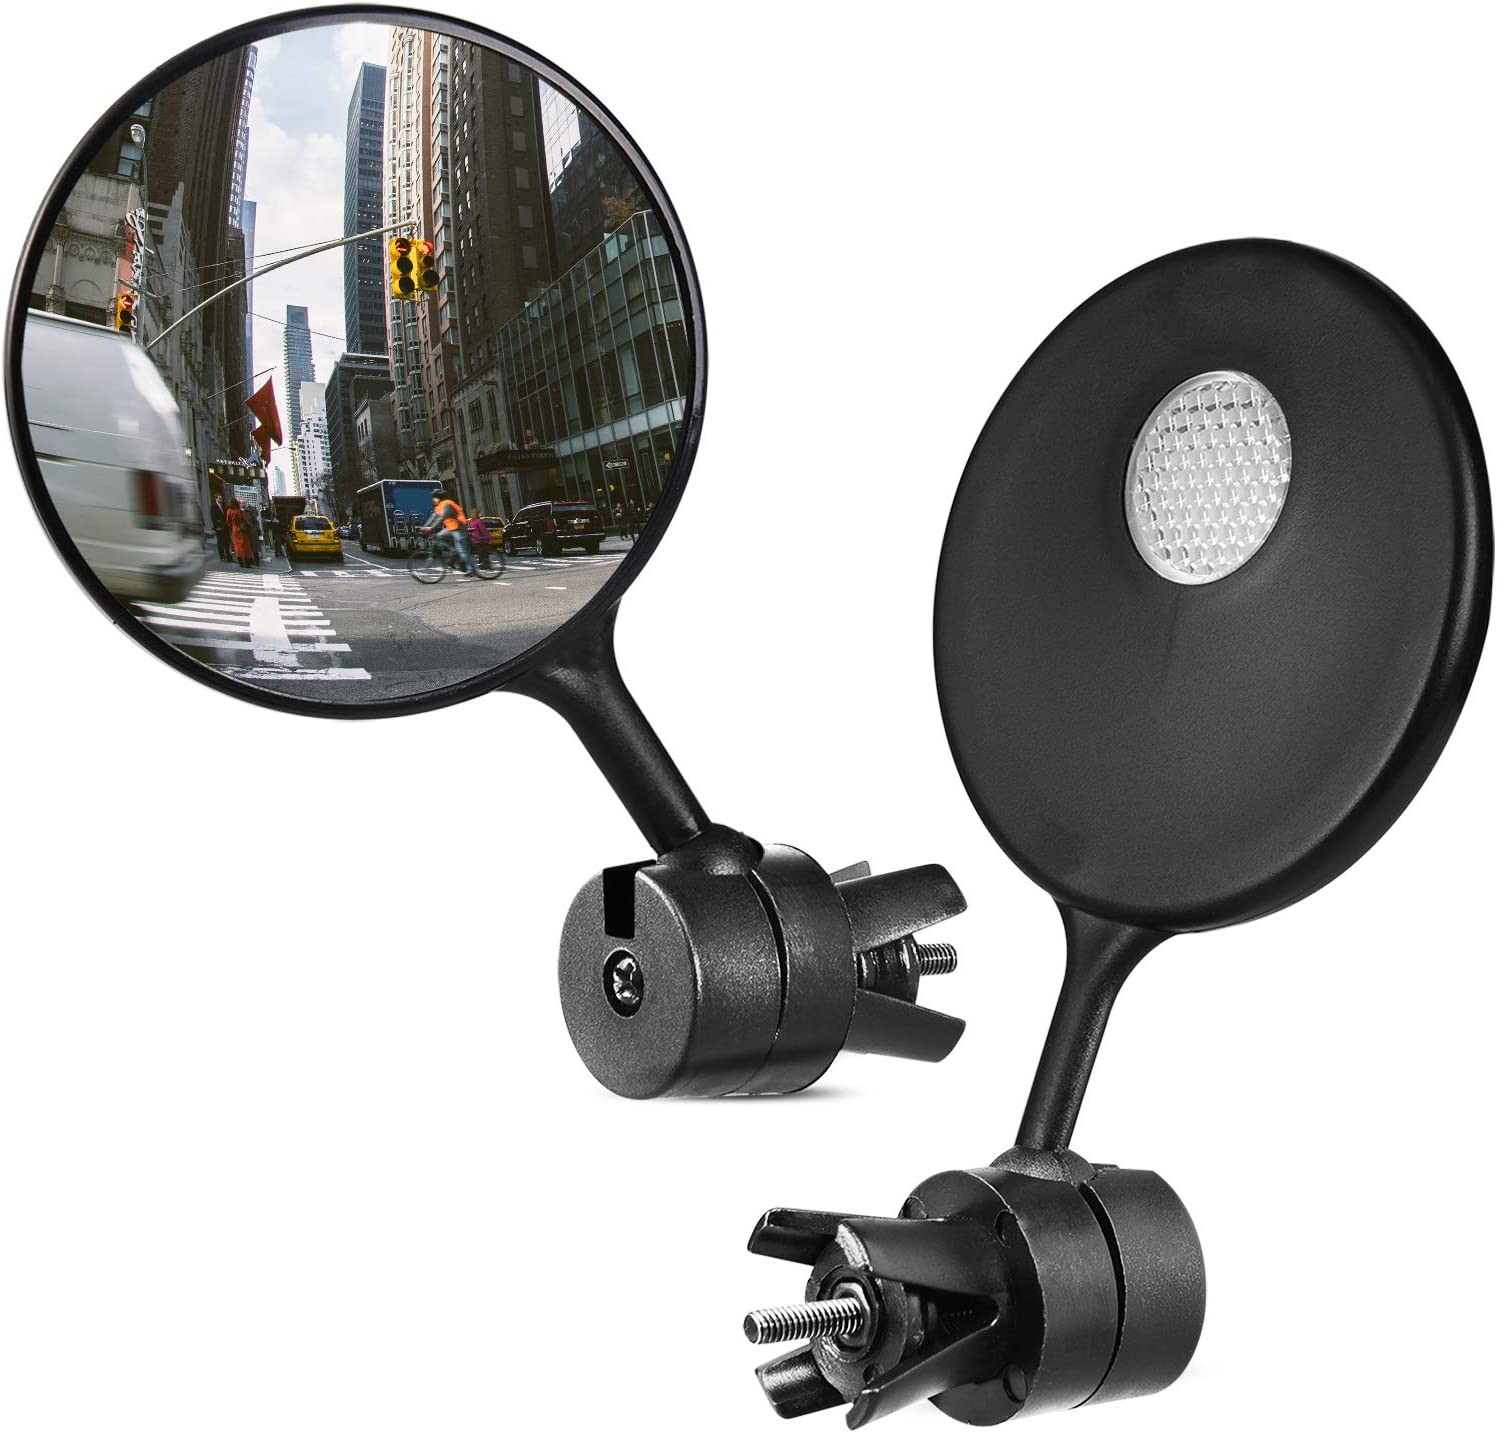 Wilxaw Set of 2 bicycle mirrors, handlebars